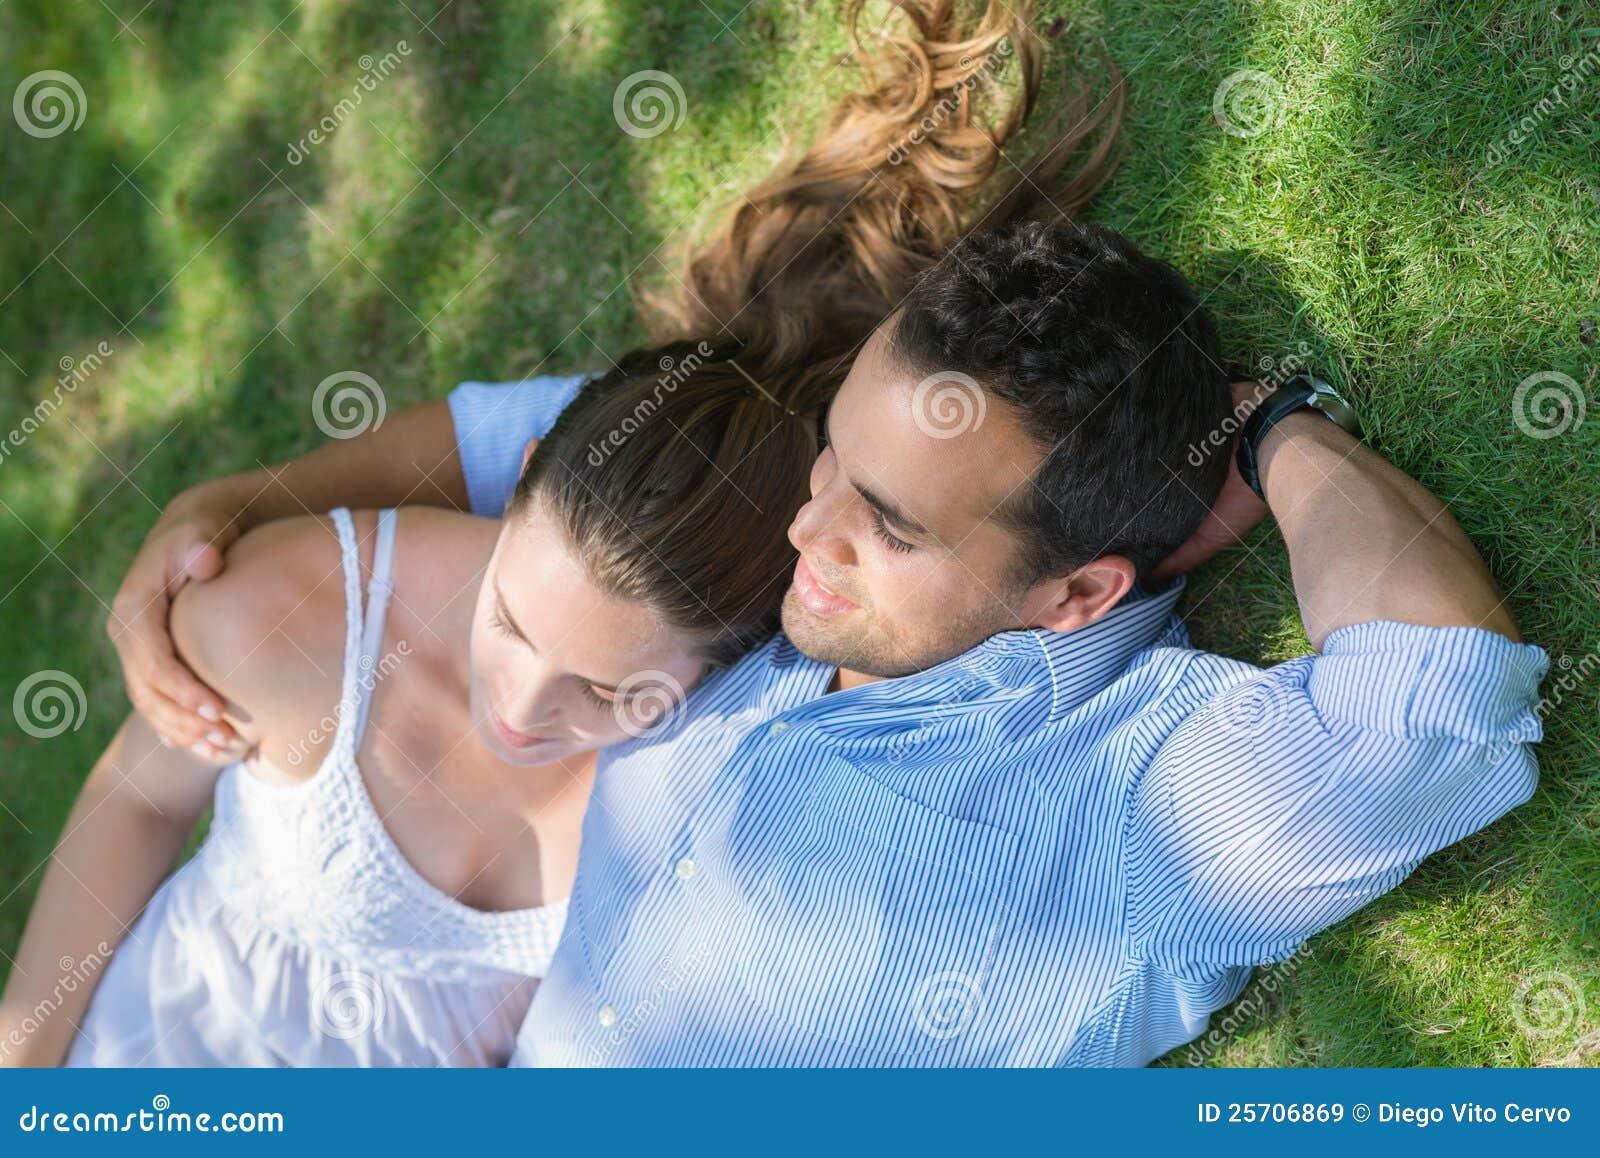 Boyfriend And Girlfriend In Love Hugging Stock Image ...